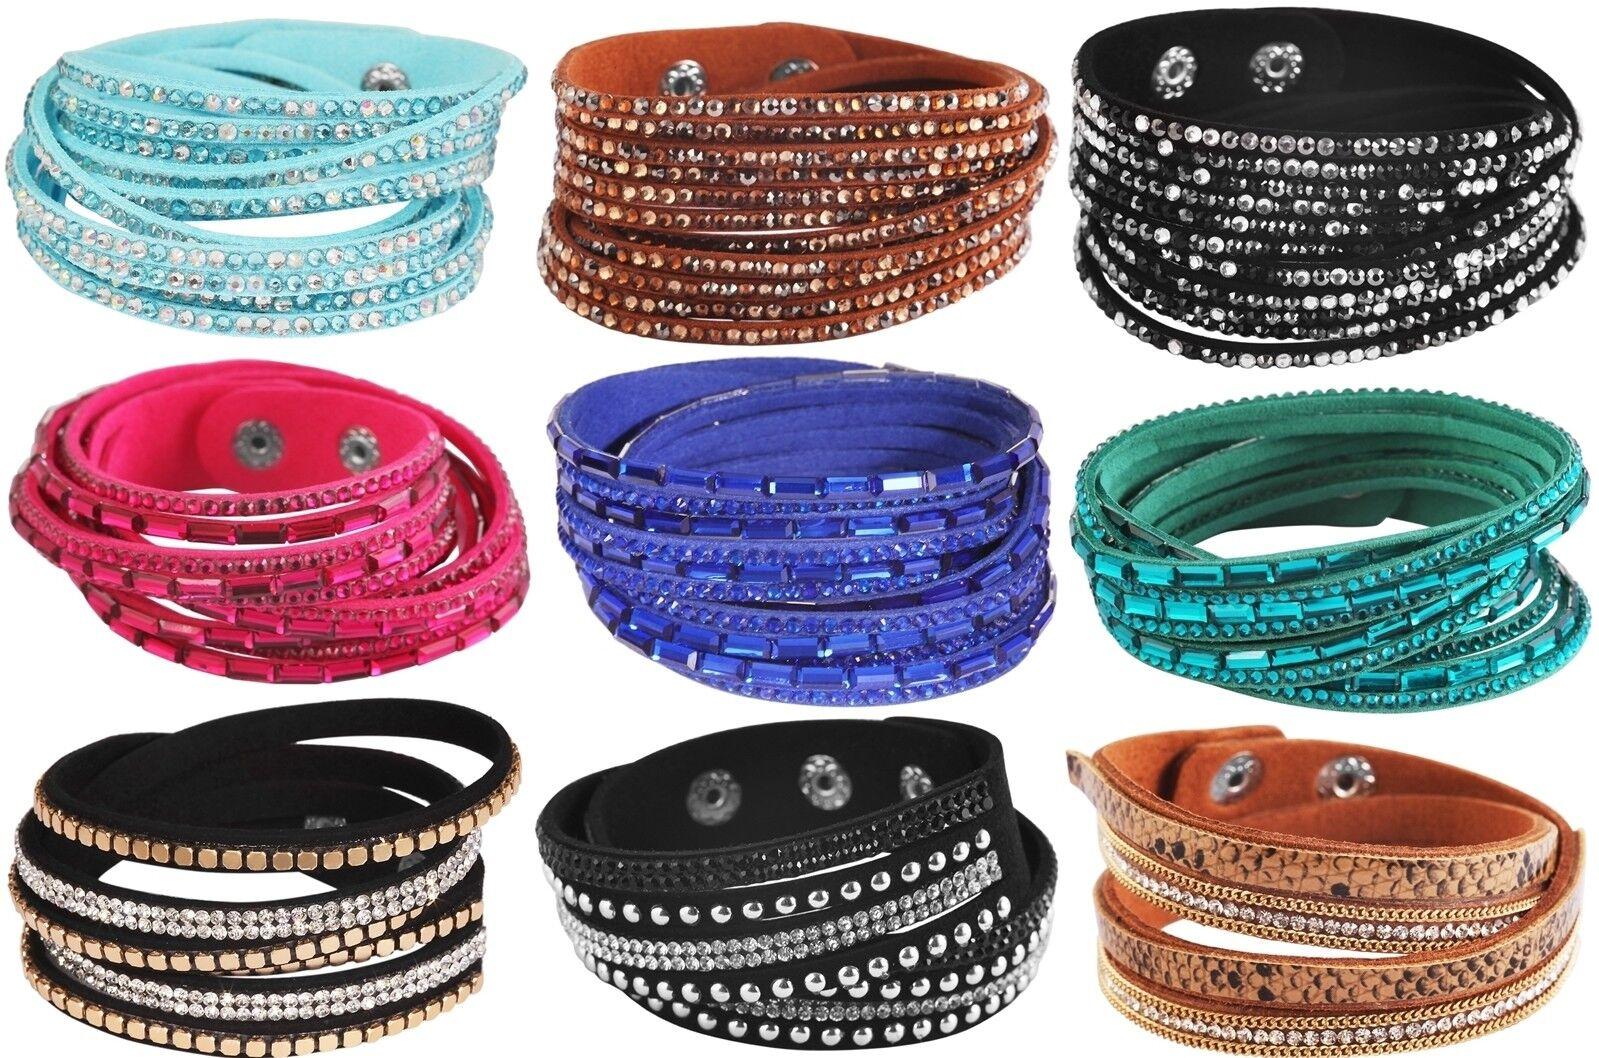 Wickelarmband Strass Damen Armband Slaker Trendy Glitzer Geschenk Bracelet WOW